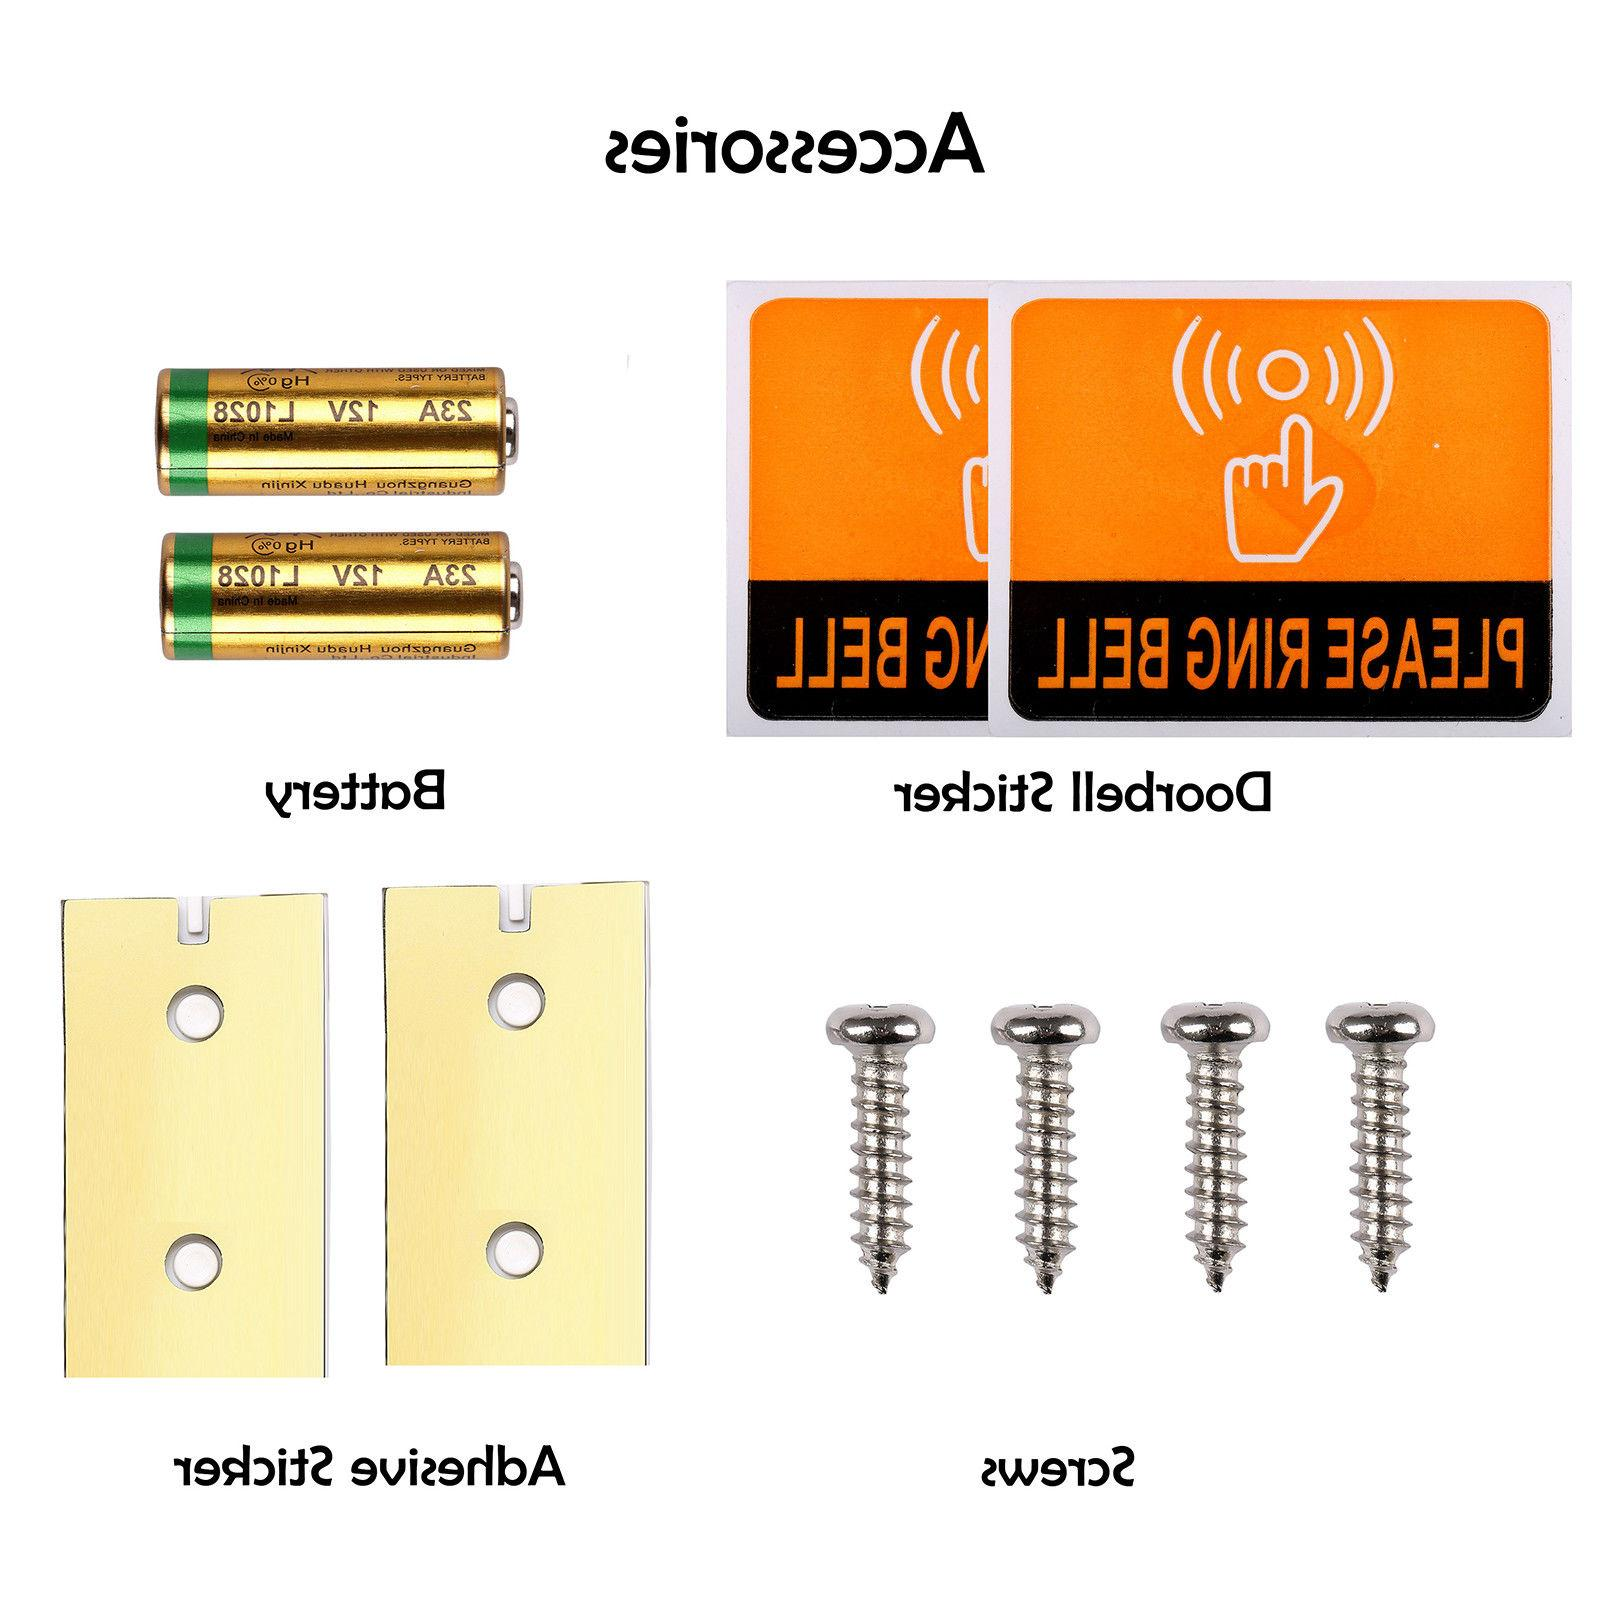 Wireless Doorbell Waterproof Chime Kits Buttons+1 Plug-In